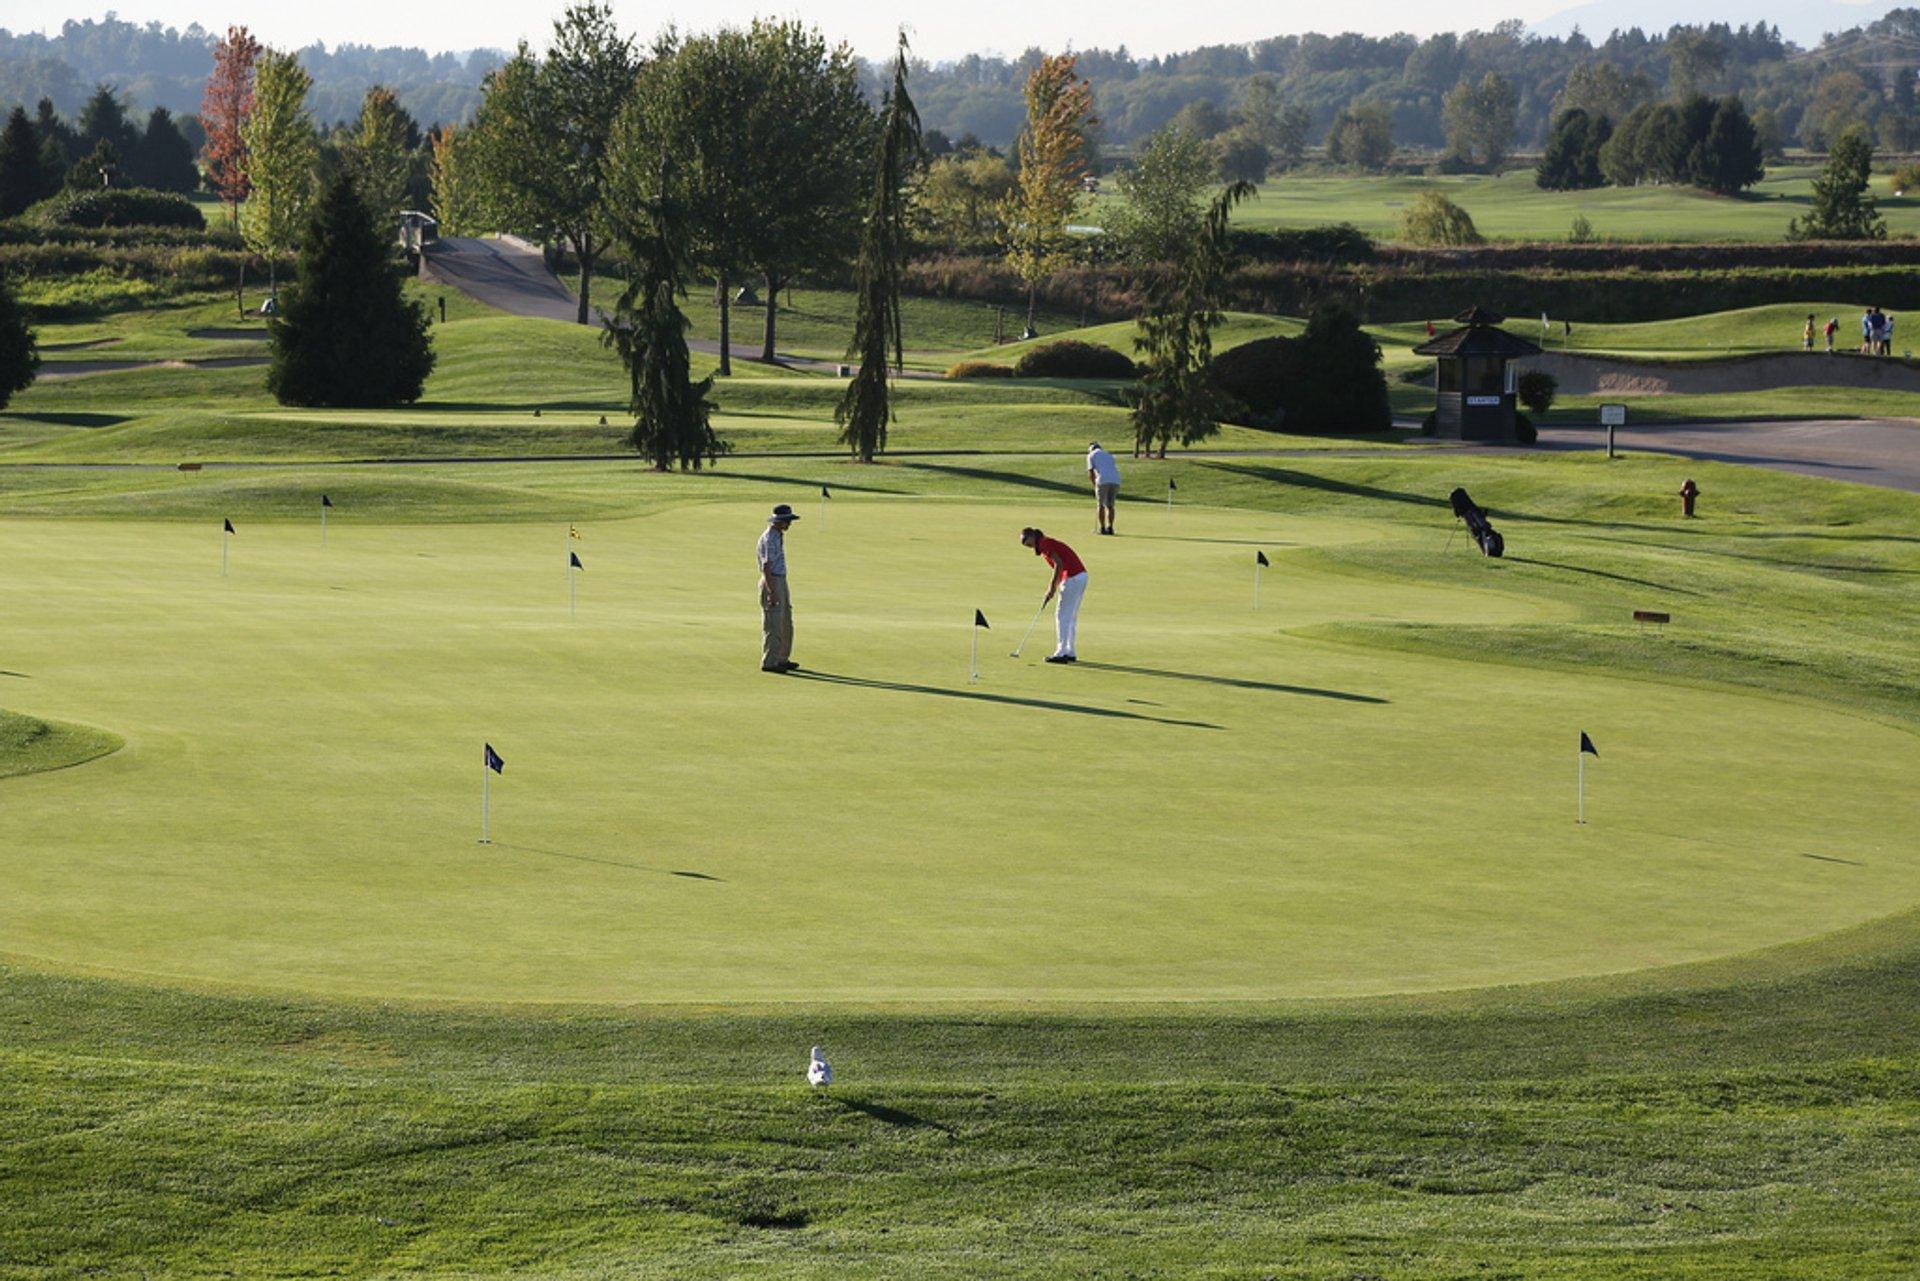 Golf in Vancouver - Best Season 2020